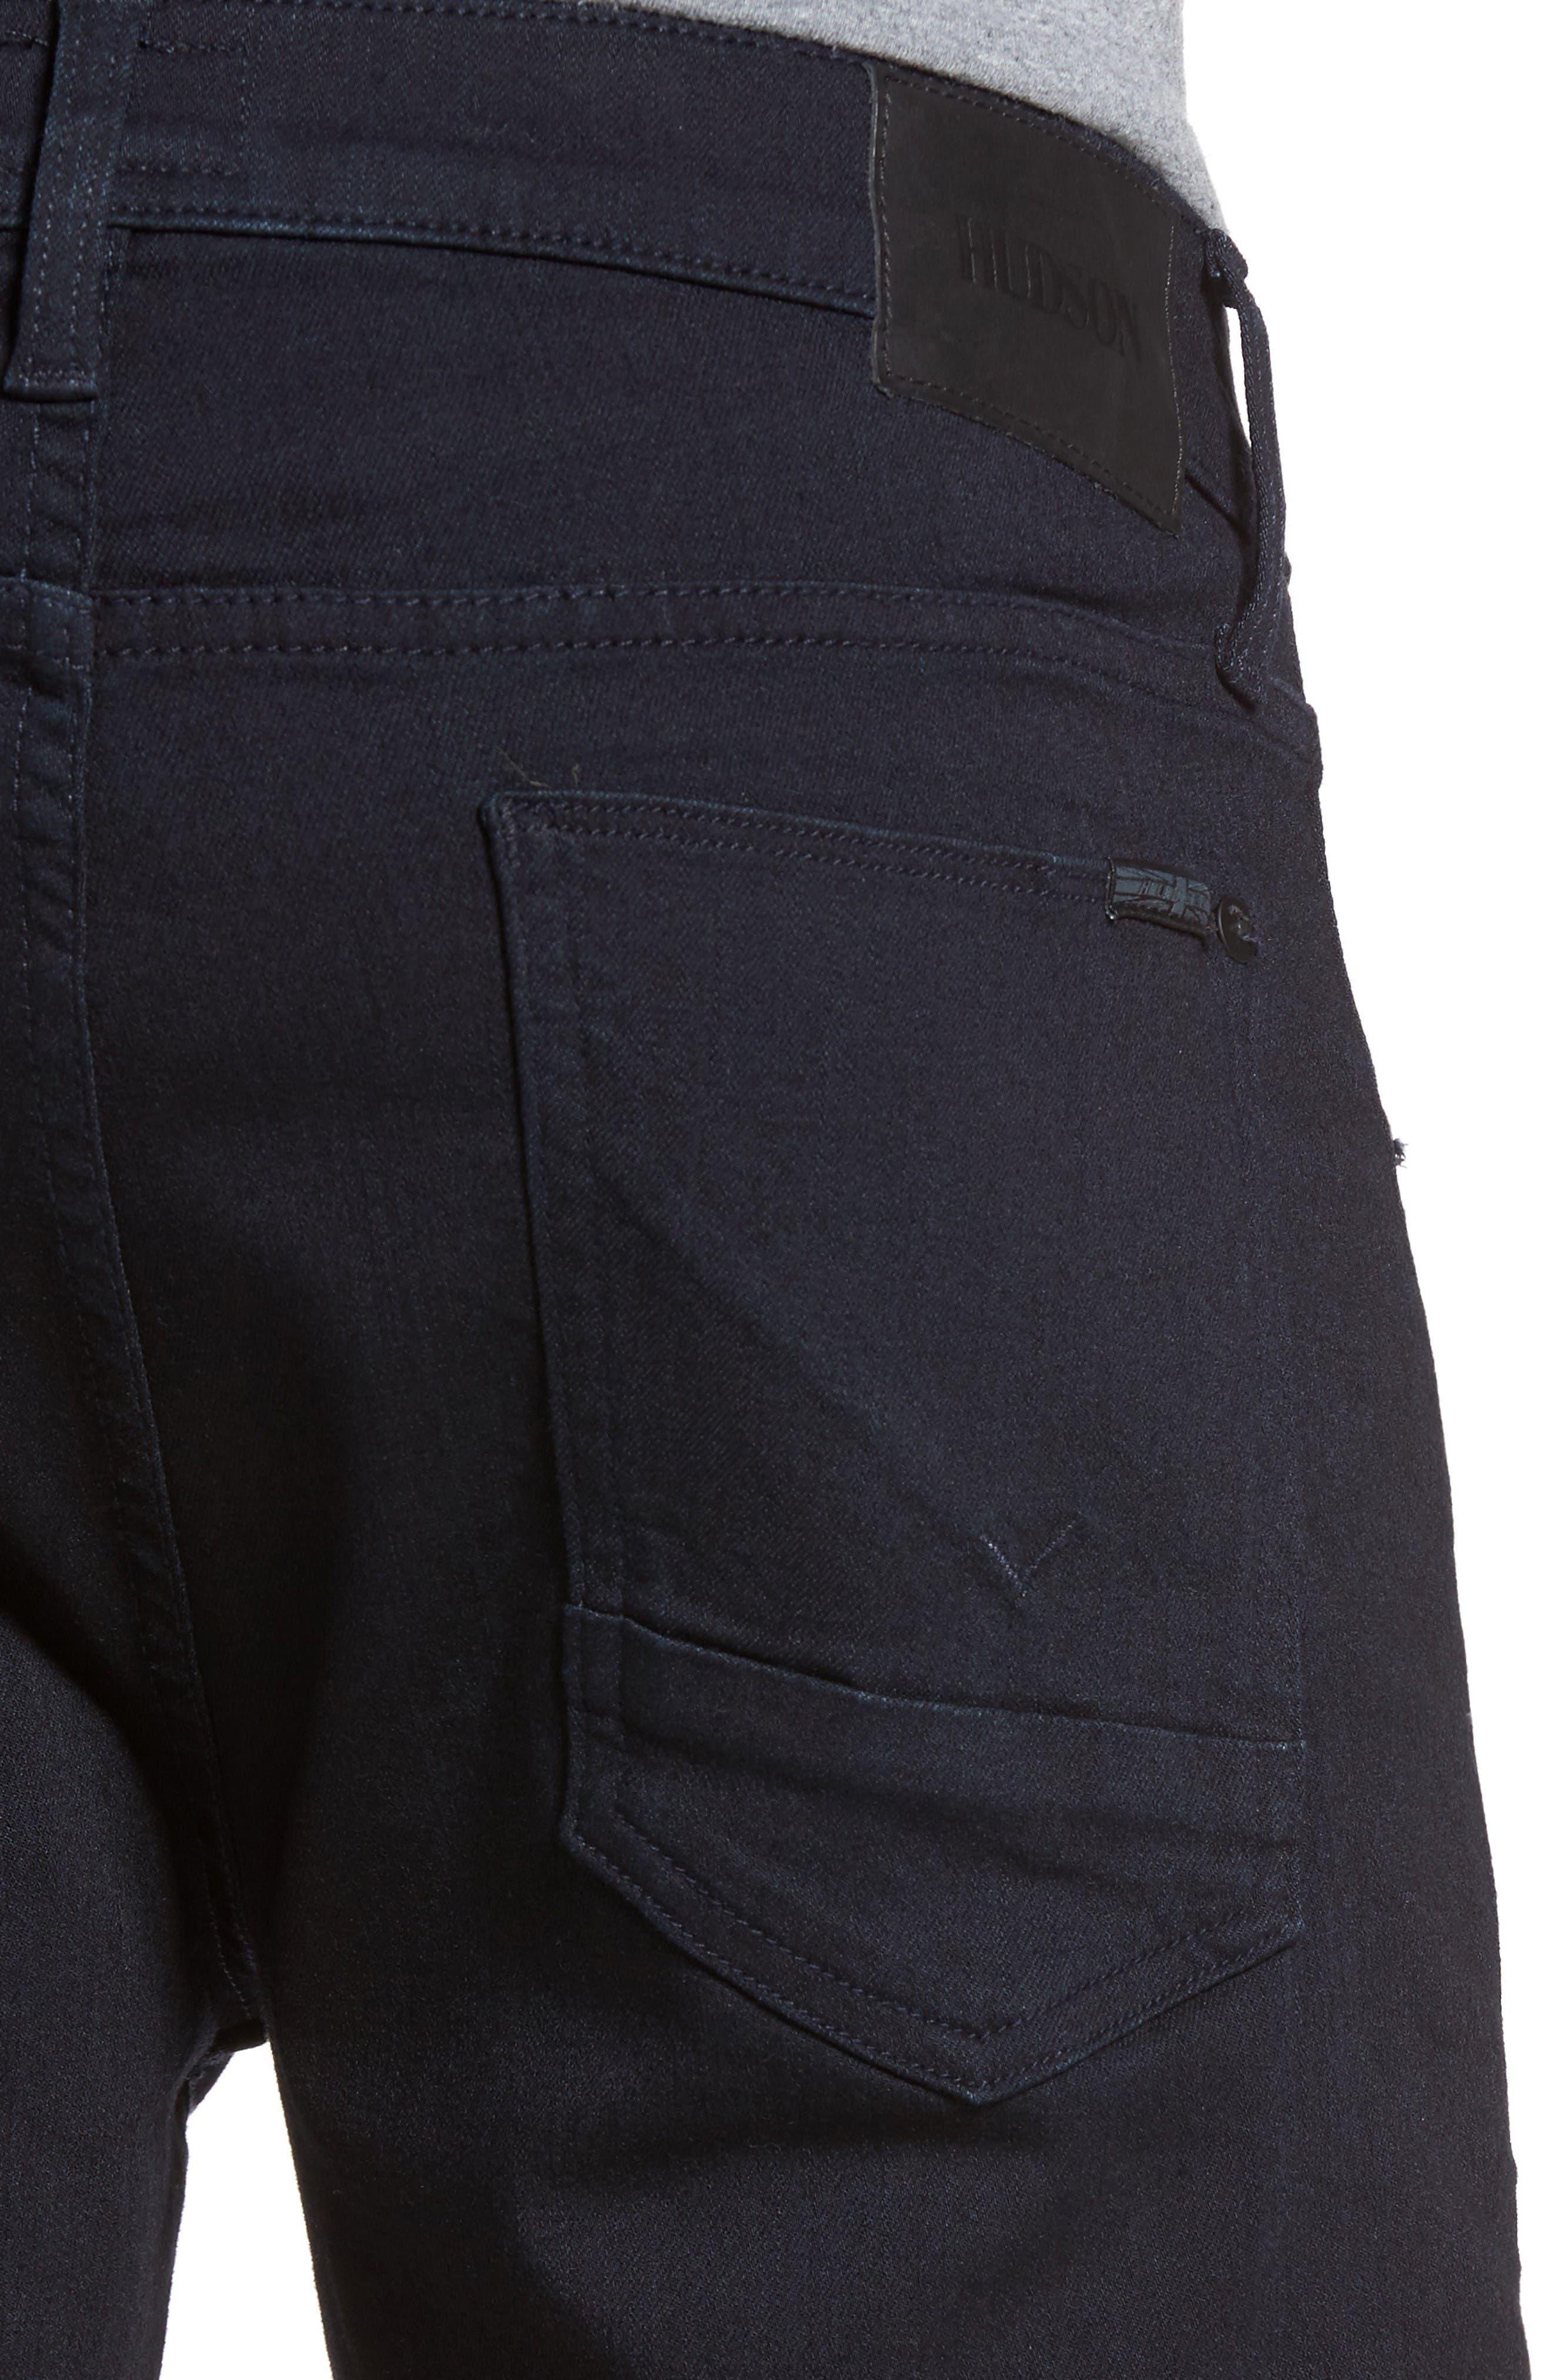 Blake Slim Fit Jeans,                             Alternate thumbnail 4, color,                             Hale Navy